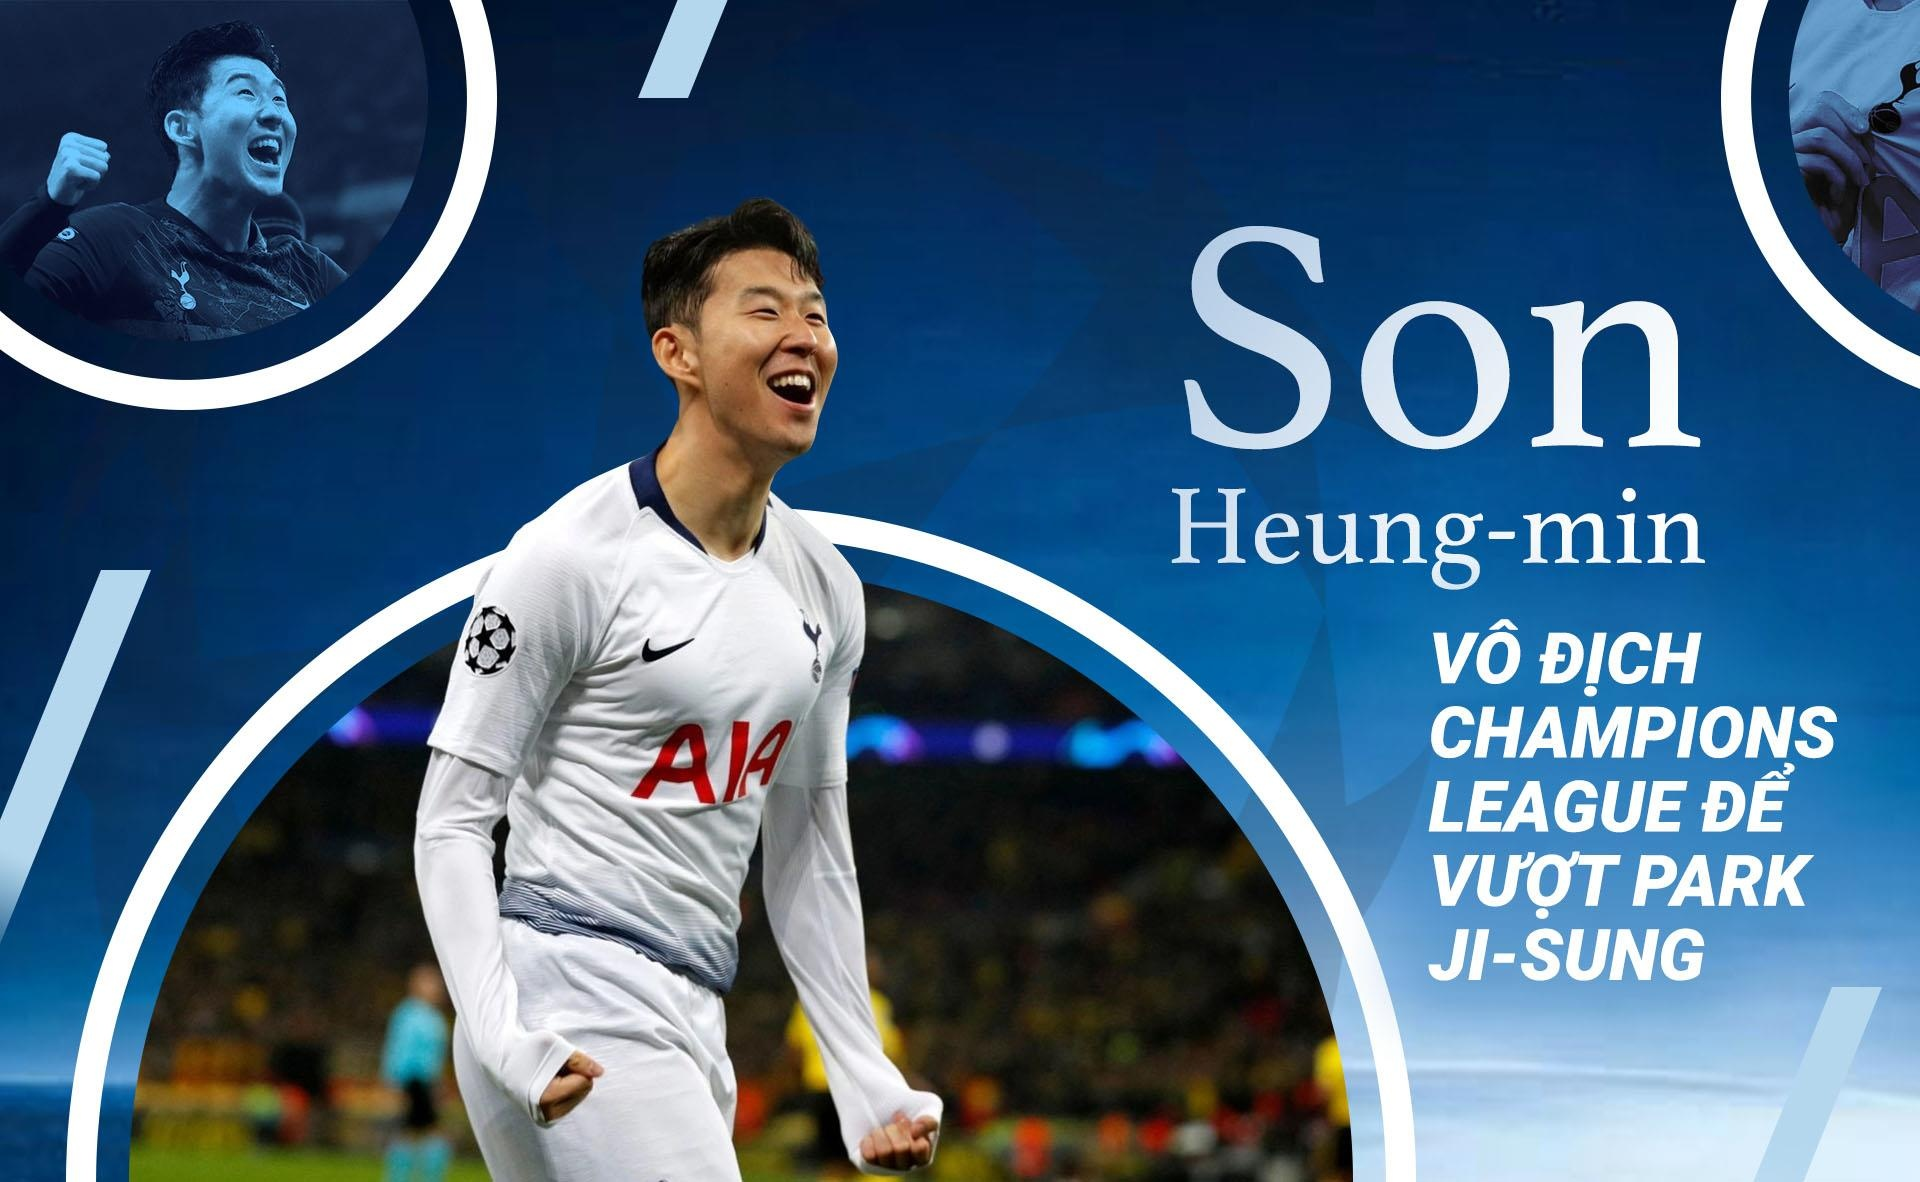 Son Heung-min vo dich Champions League de vuot Park Ji-sung hinh anh 2